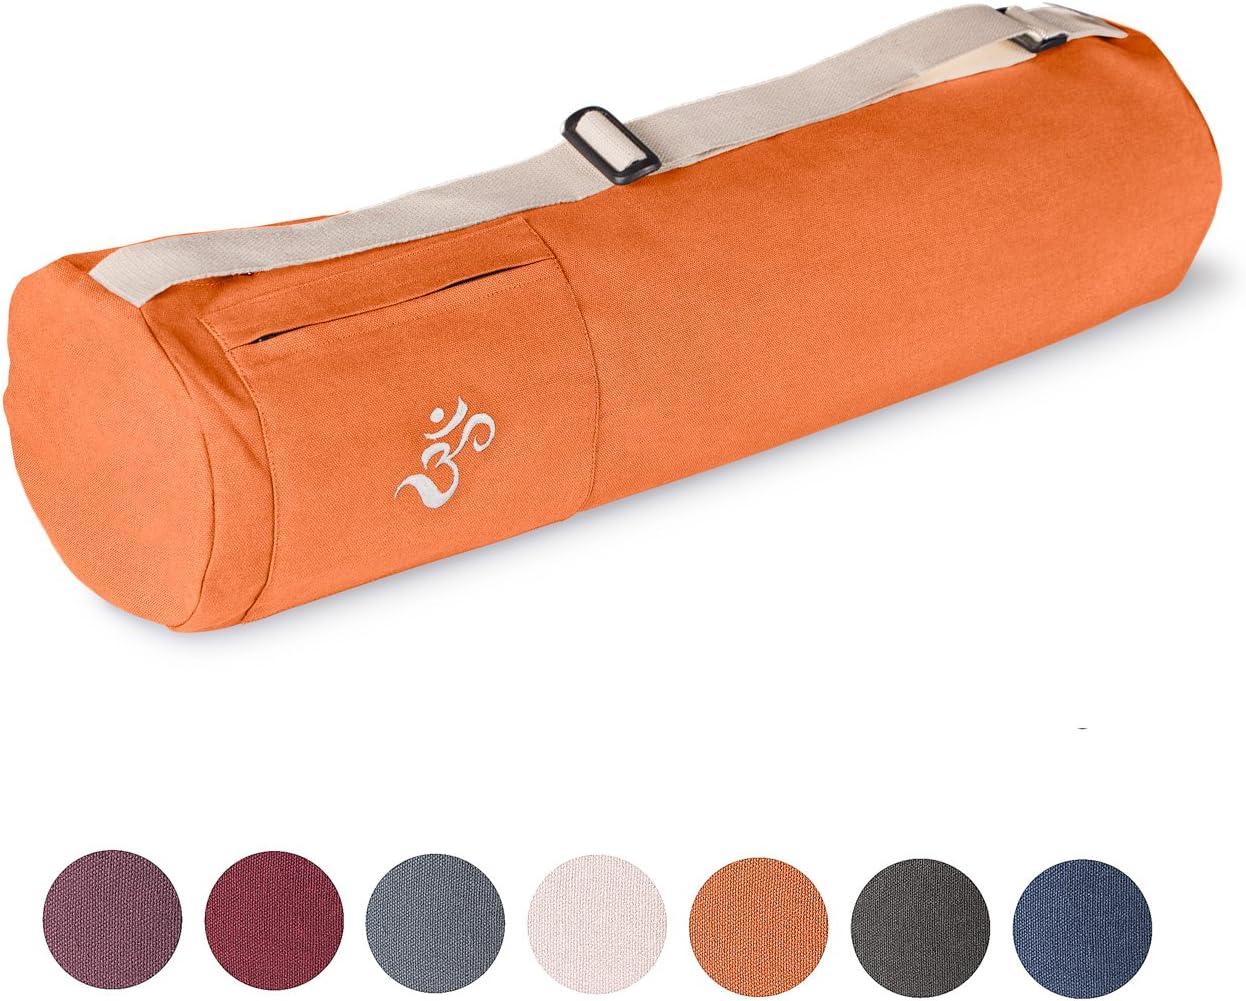 Yoga Mat Cover Yoga Equipment Bag Yoga Bag for Yoga Mat Yoga Mat Carrier Bag Fair /& Ecological GOTS Certified Yoga Bag Made of 100/% Organic Cotton Lotuscrafts Yoga Mat Bag MYSORE